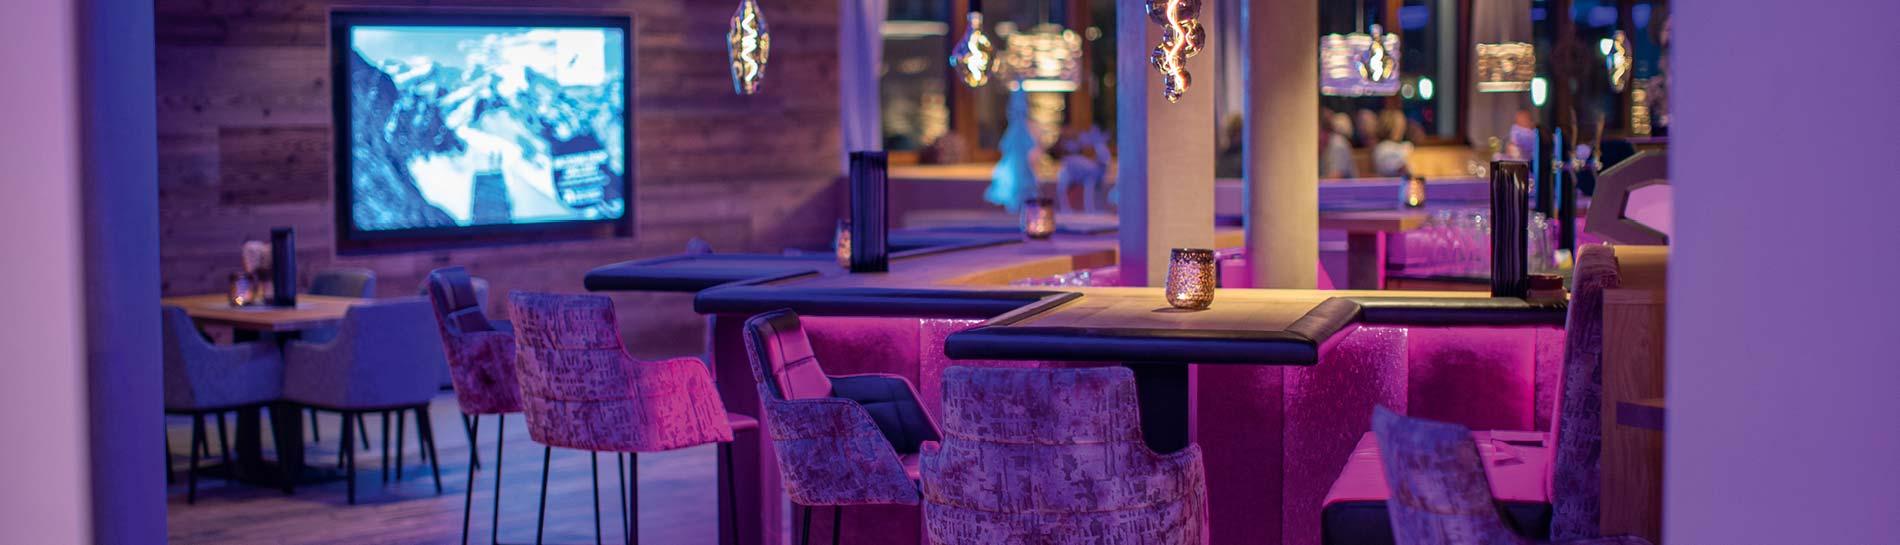 Sportresort Alpenblick Hotel Zell am See Austria Keyfotos Niche Destinations 3